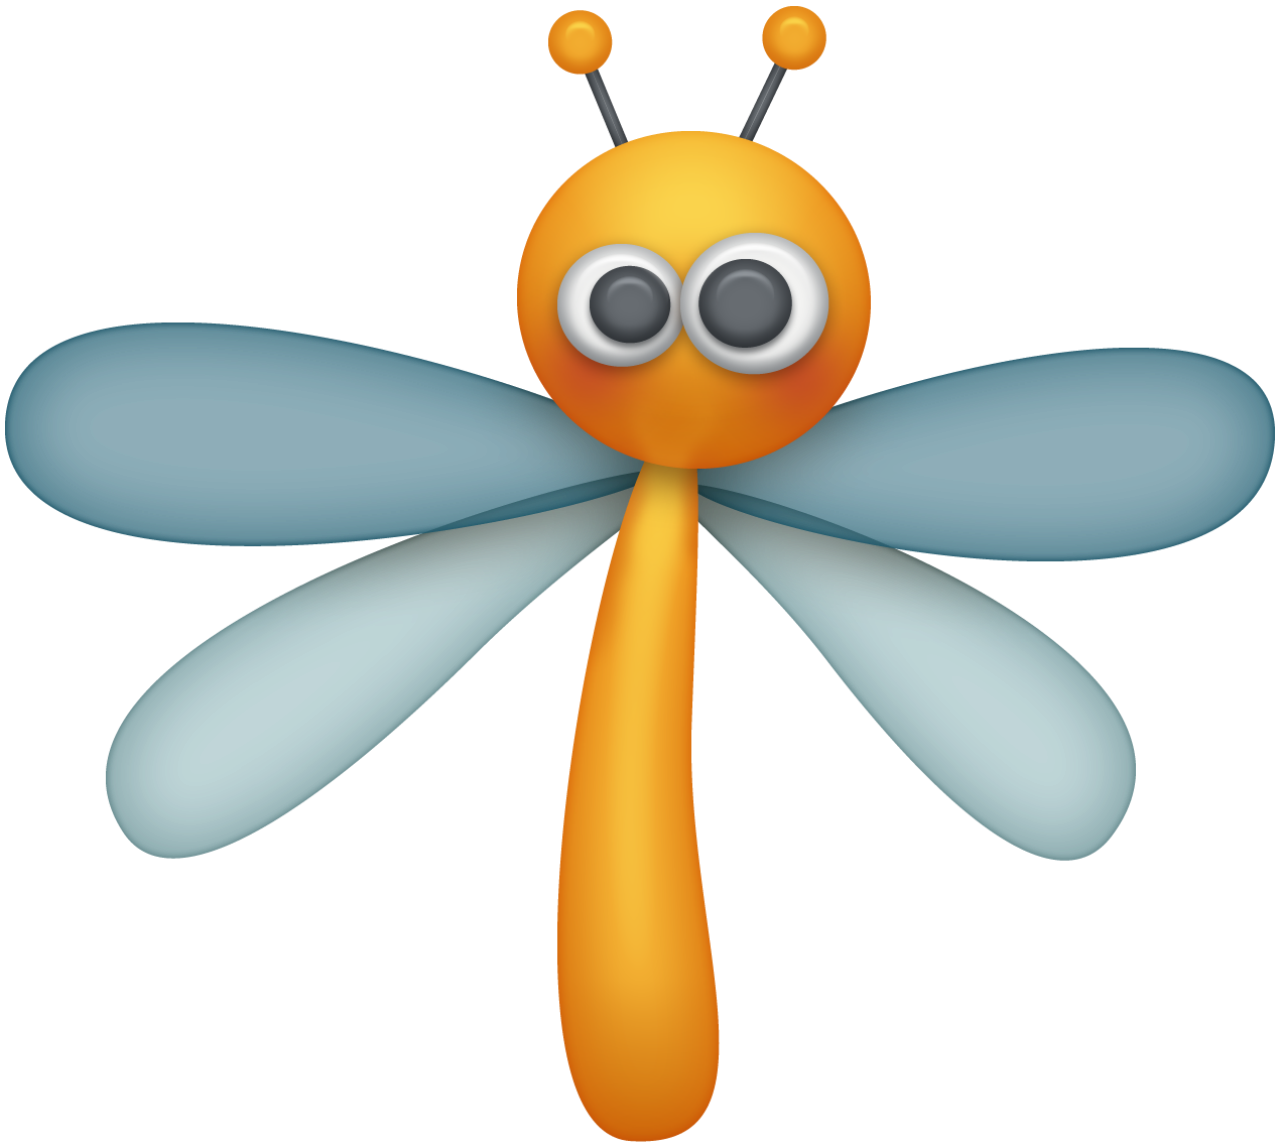 fcdd d orig. Dragonfly clipart creative